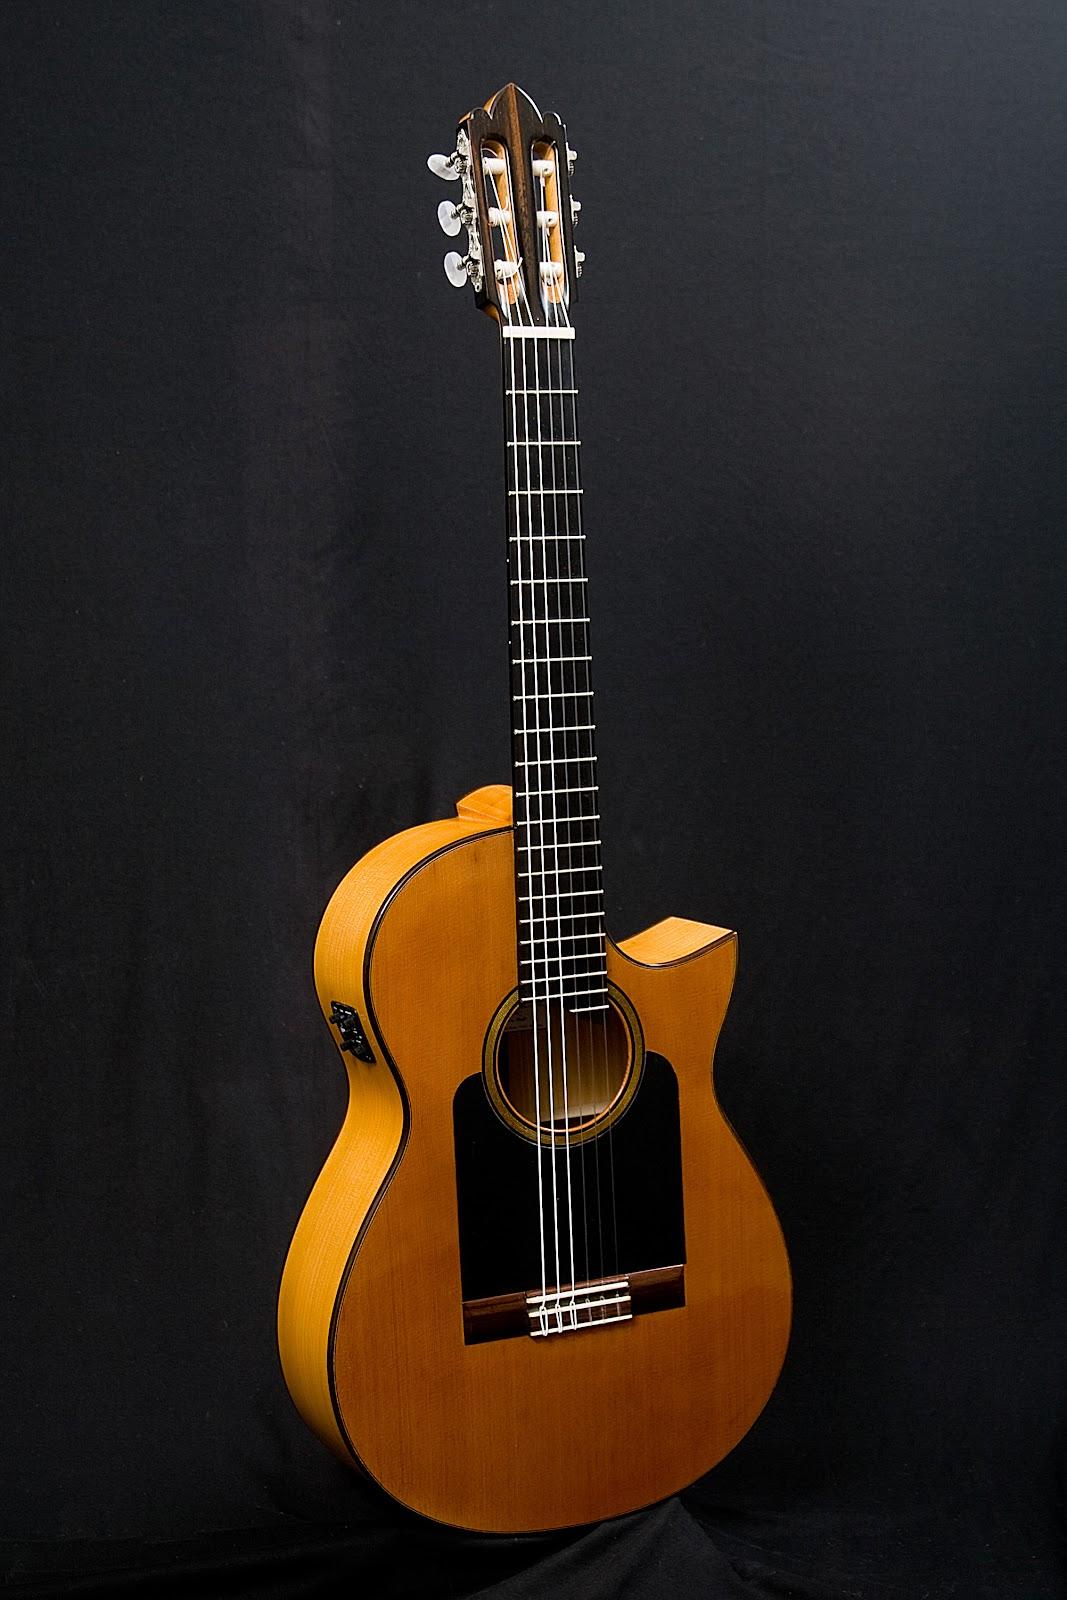 guitarras custom constru das por rodolfo cucculelli luthier trouver une guitare lectro. Black Bedroom Furniture Sets. Home Design Ideas